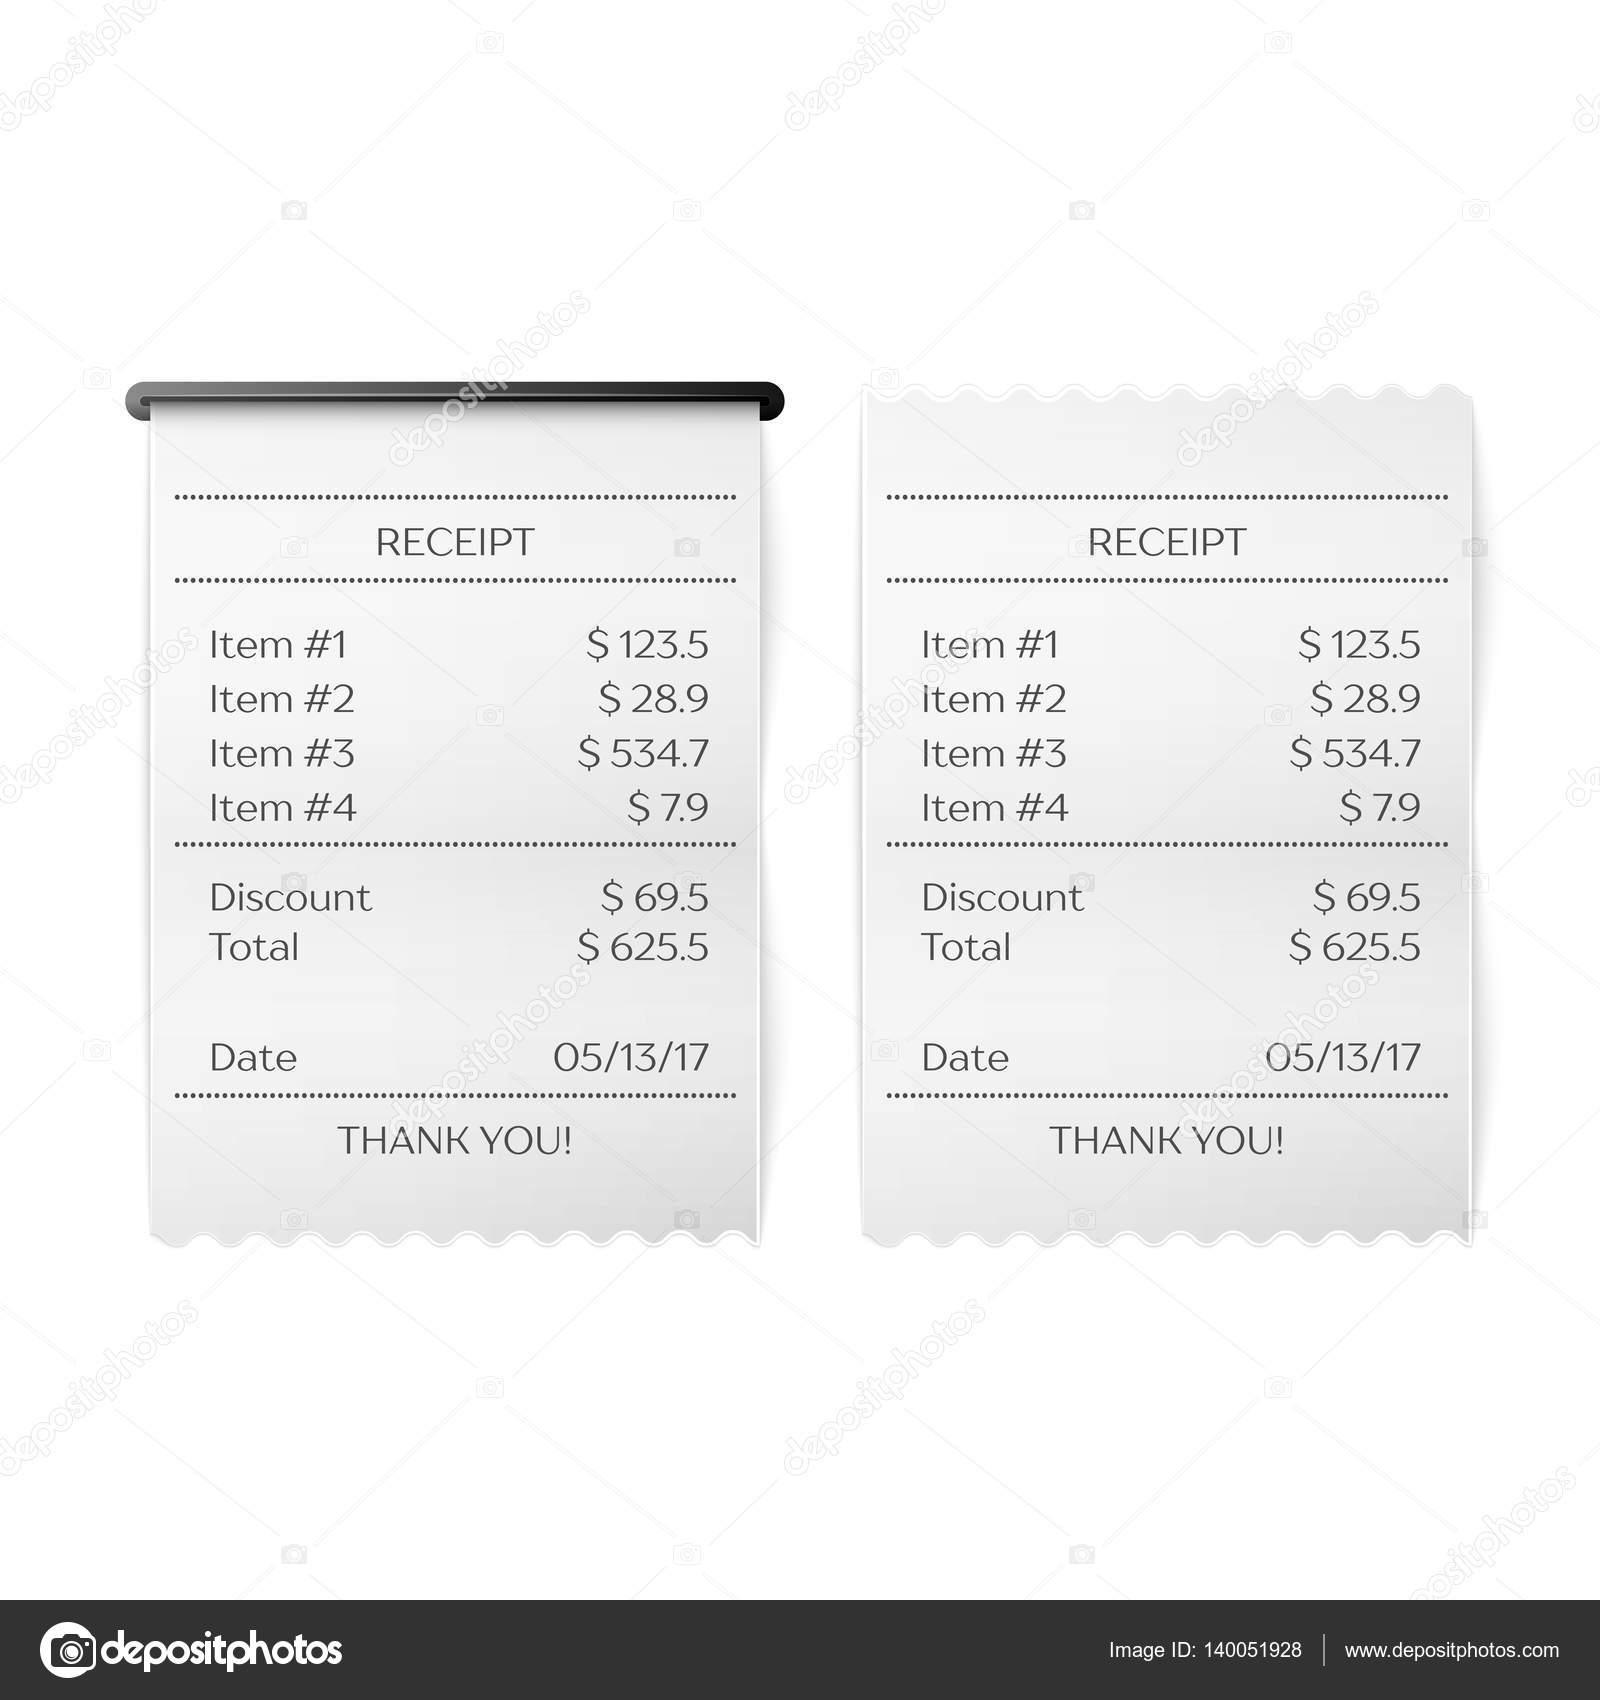 Gedruckte Quittung Vektor — Stockvektor © Netkoff #140051928